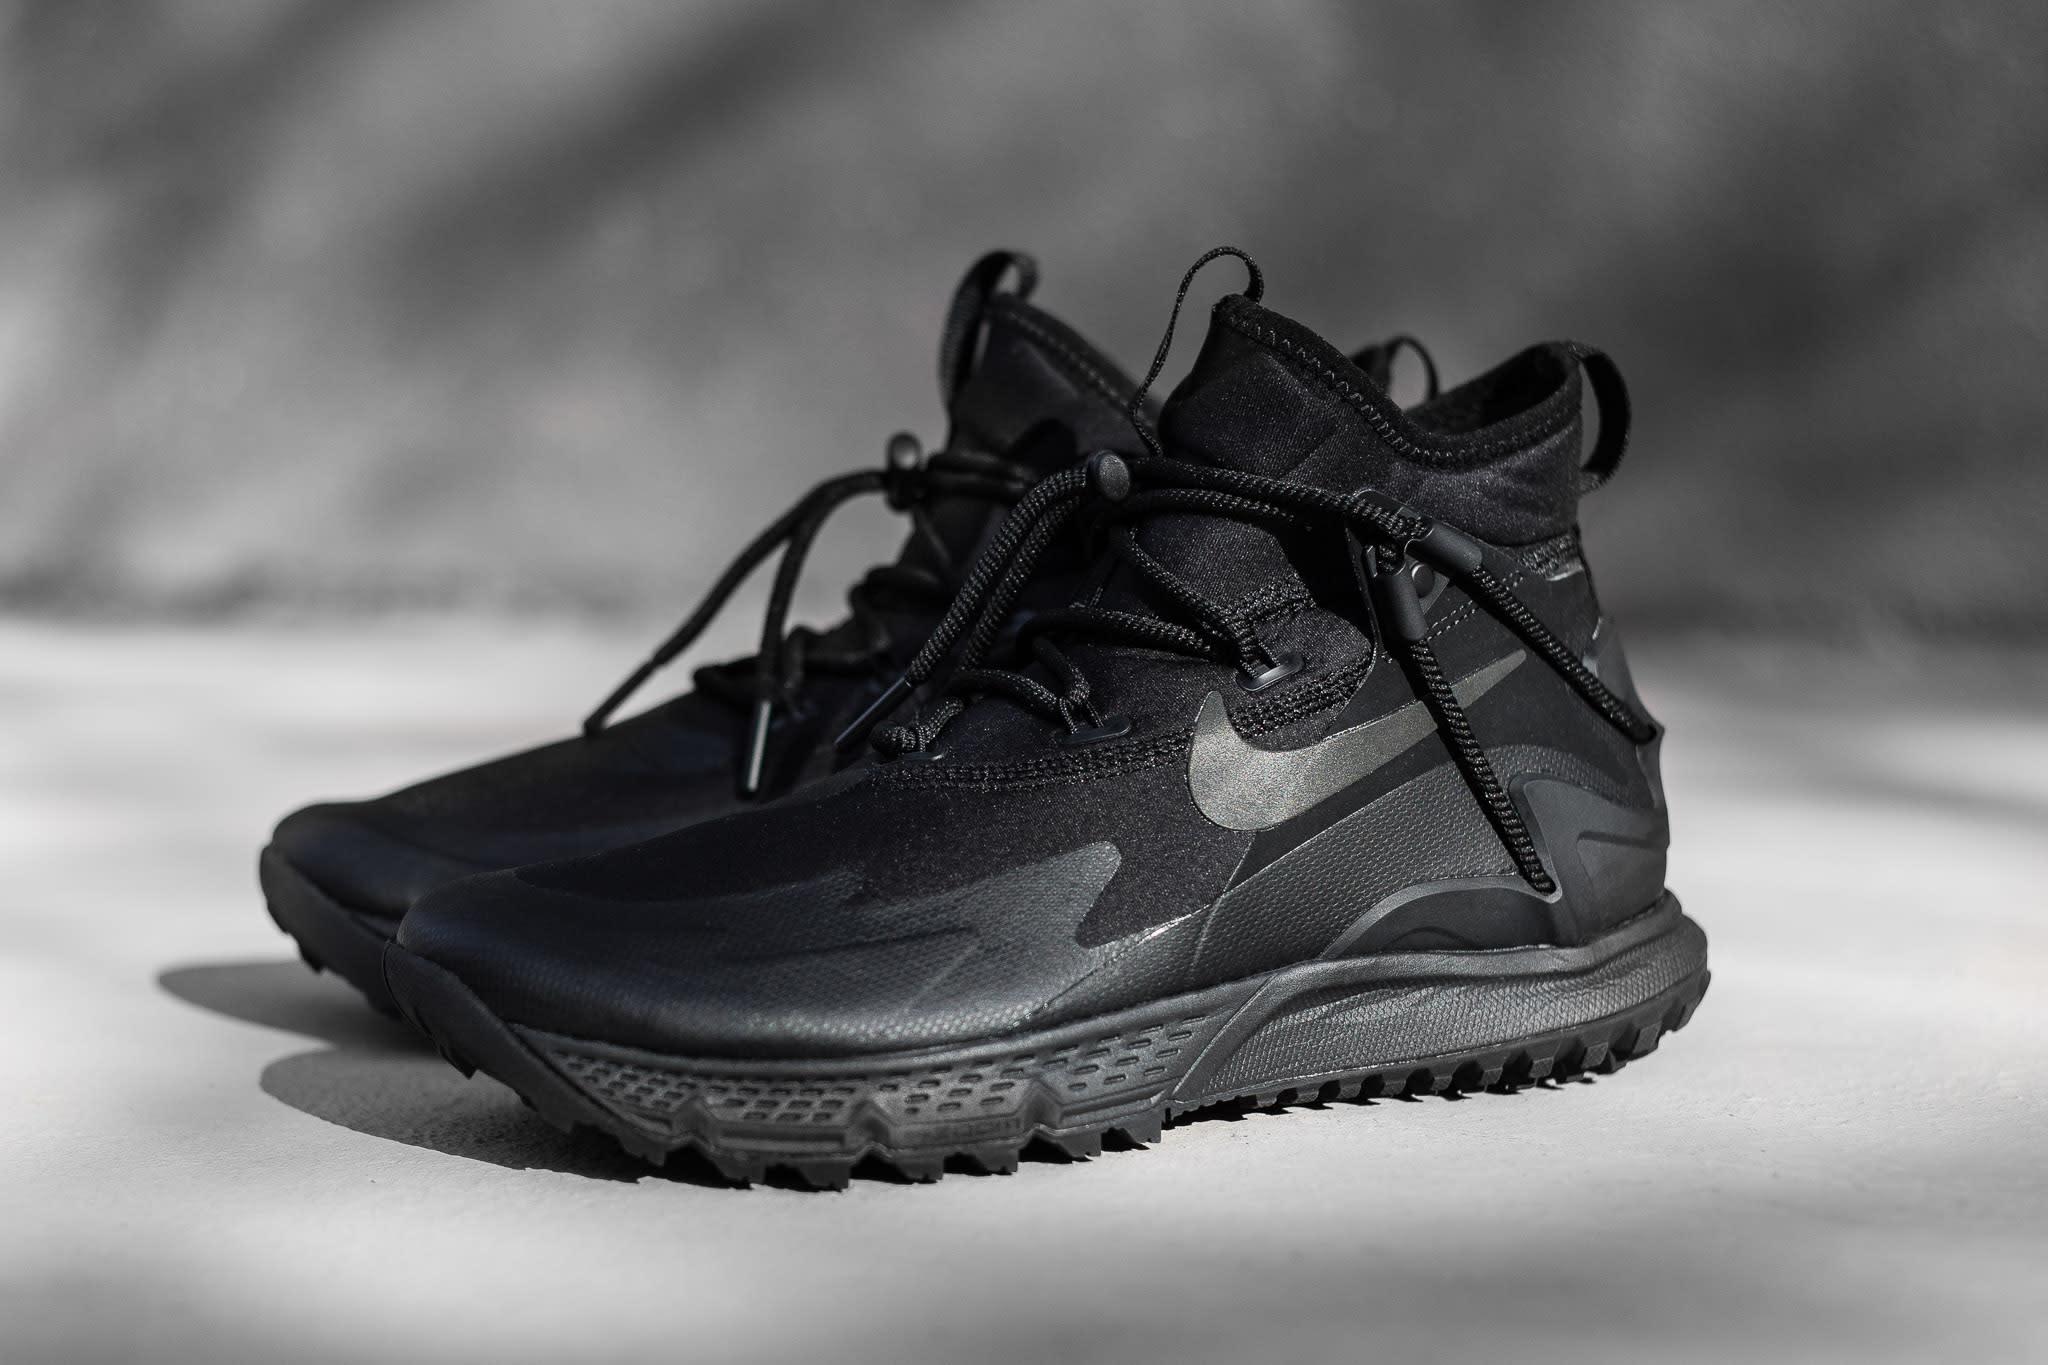 Nike Terra Sertig Boot Black / Metallic